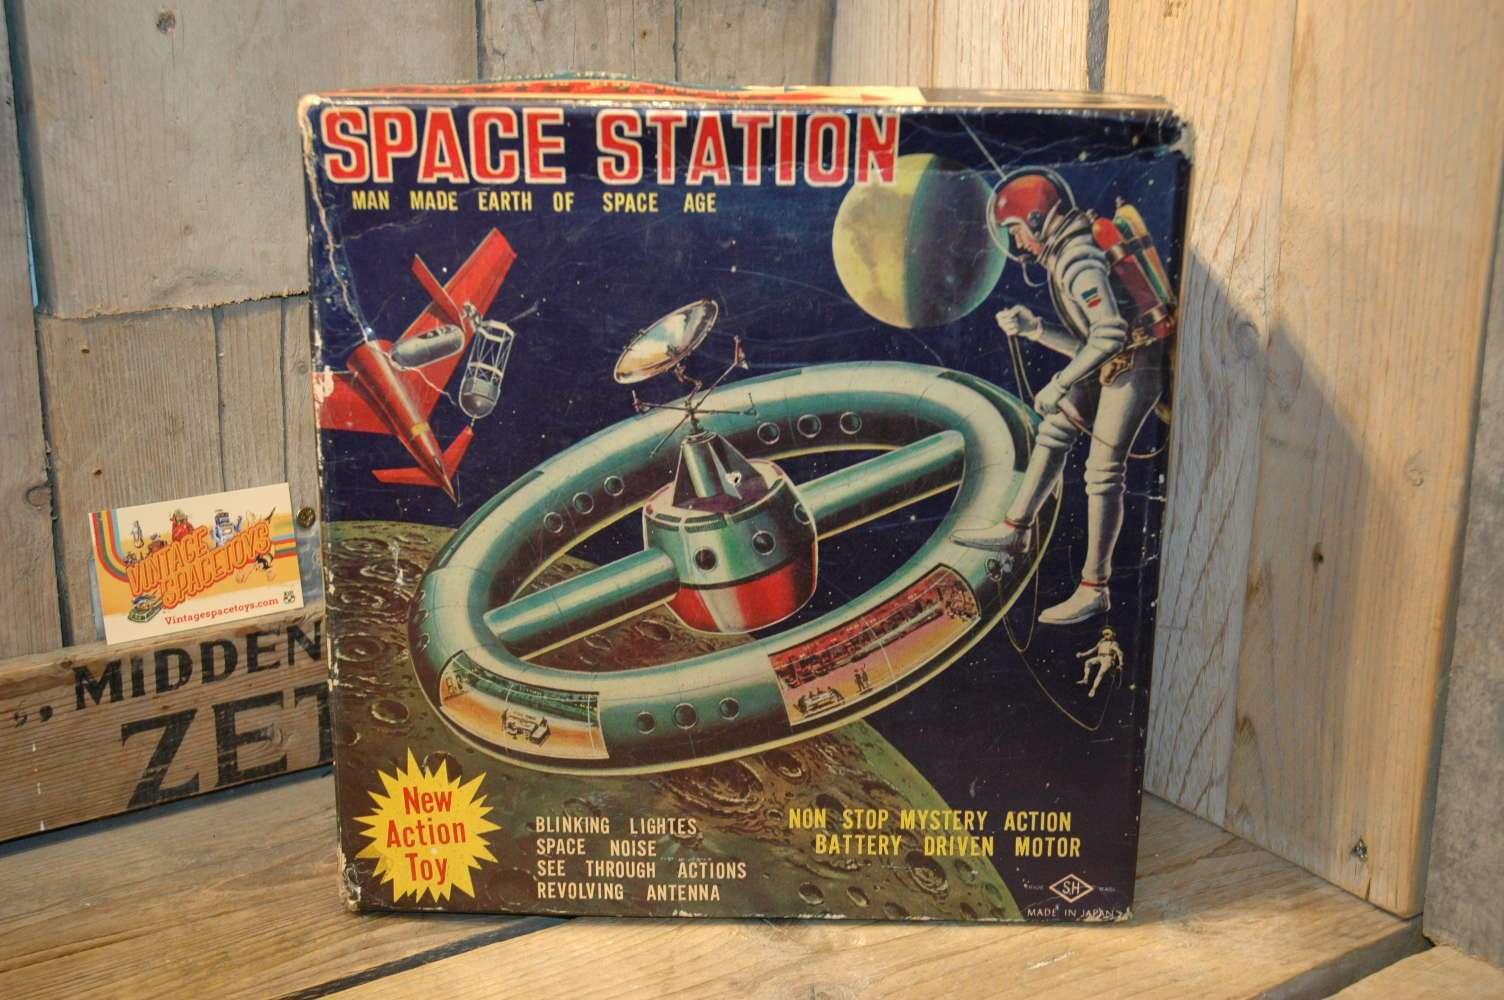 Horikawa - Space Station